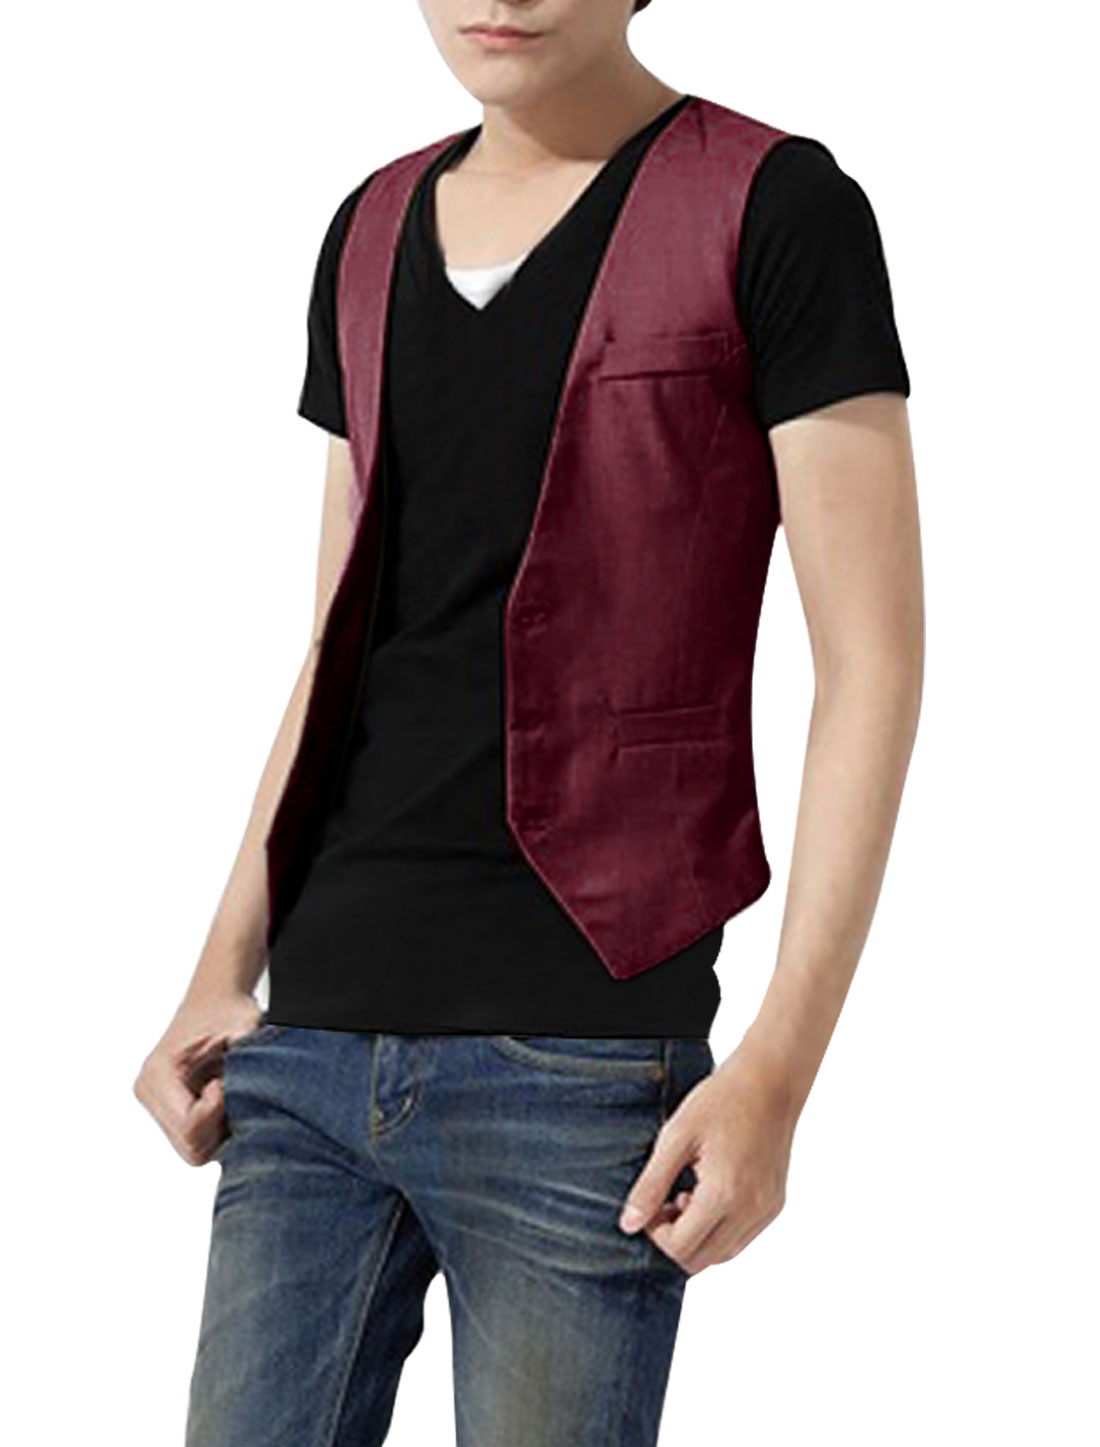 Men Stylish Sleeveless Buckle Decor Back Burgundy Vests S